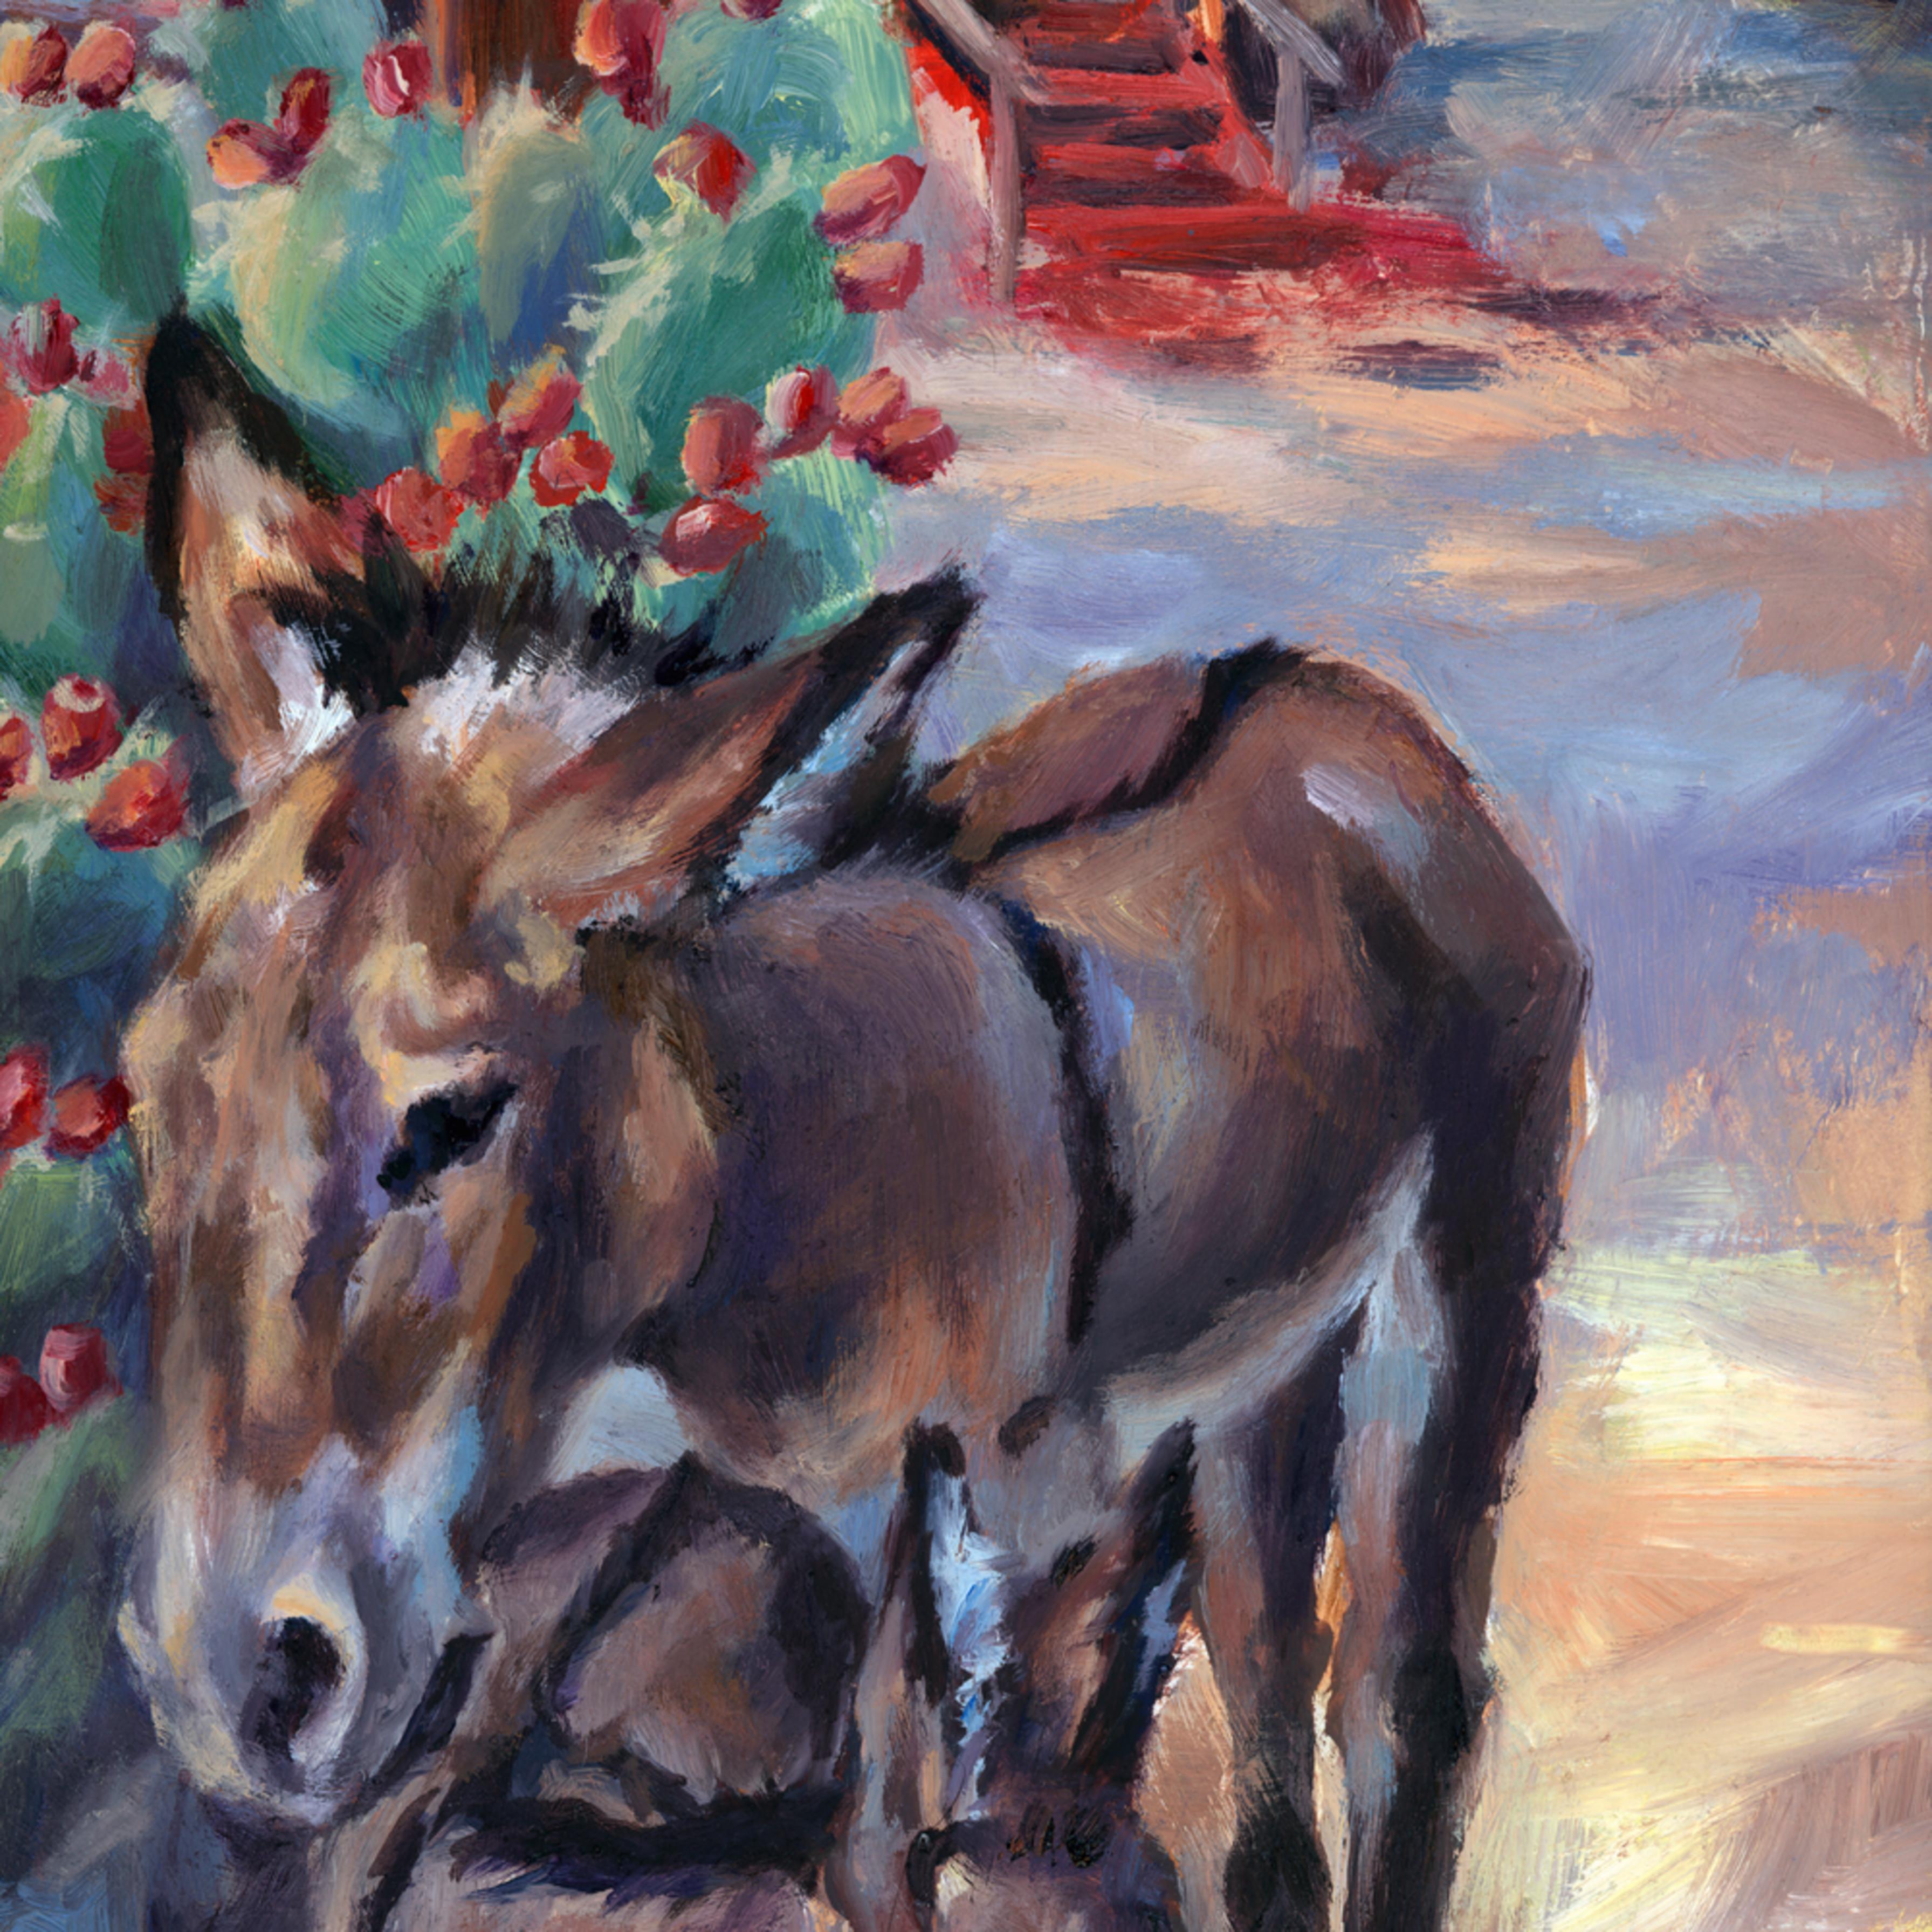 Donkeycapital3 jzbxza